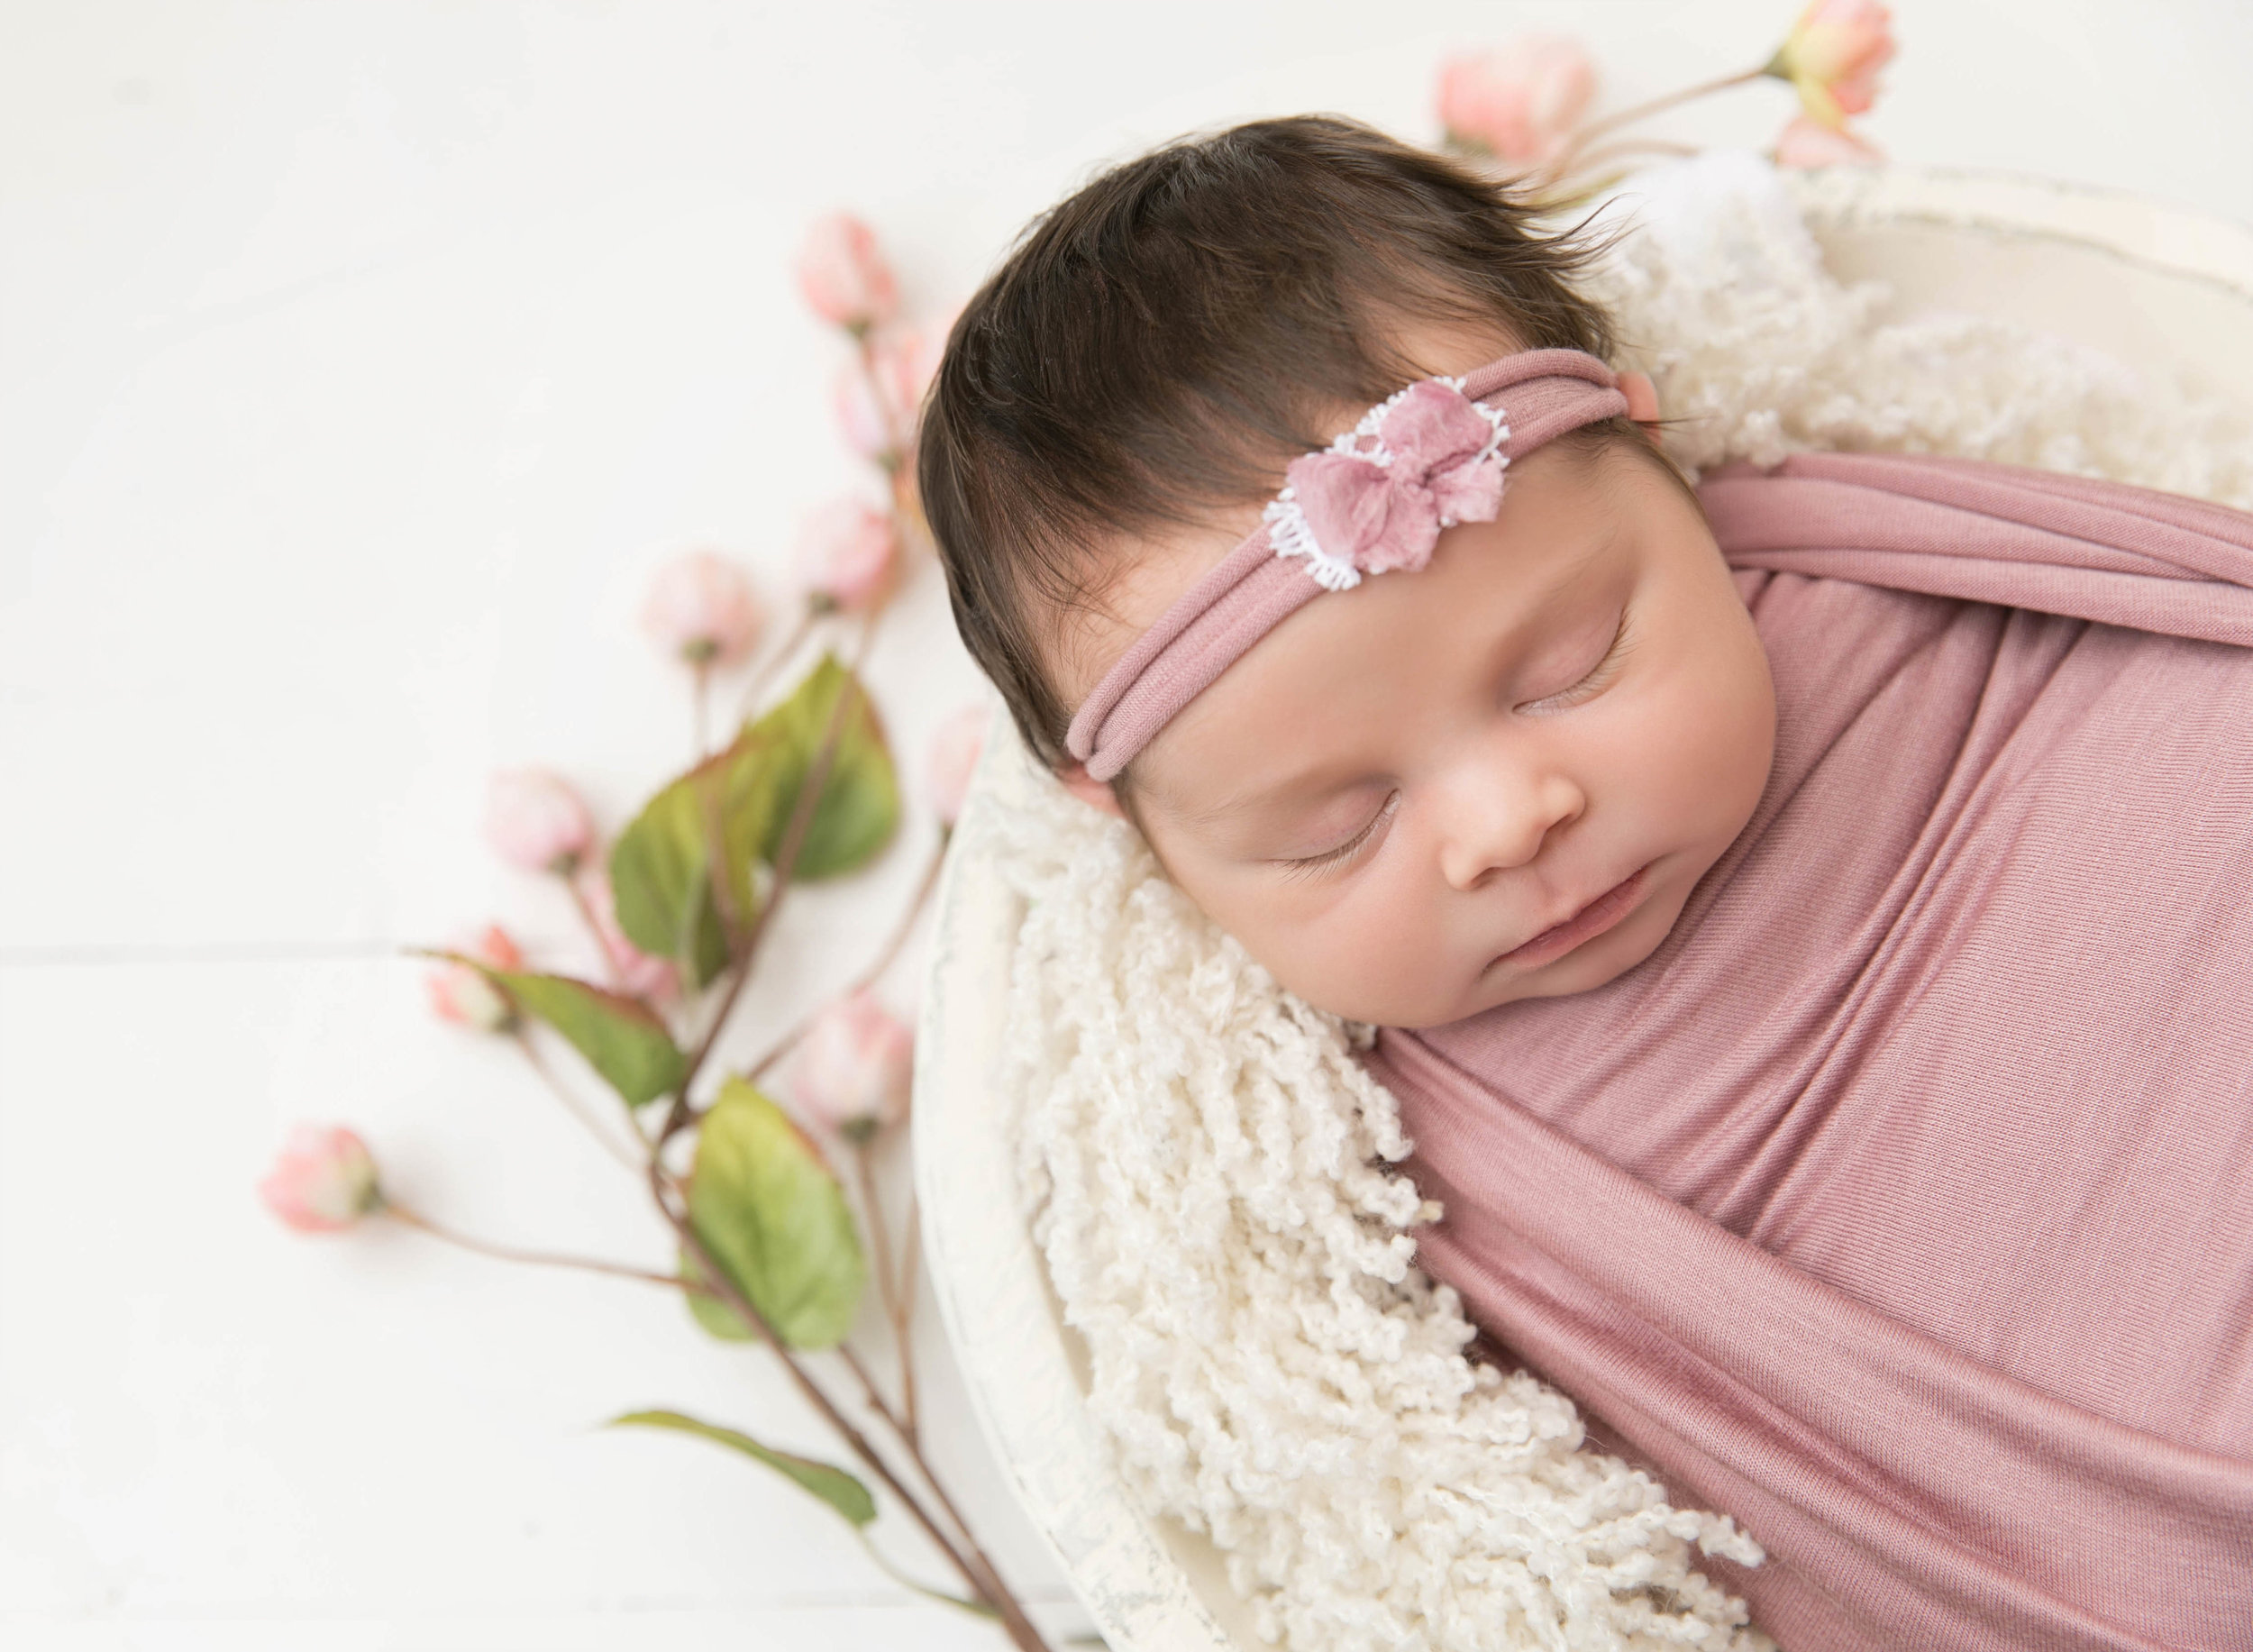 Newborn Photographer Morgan Bress